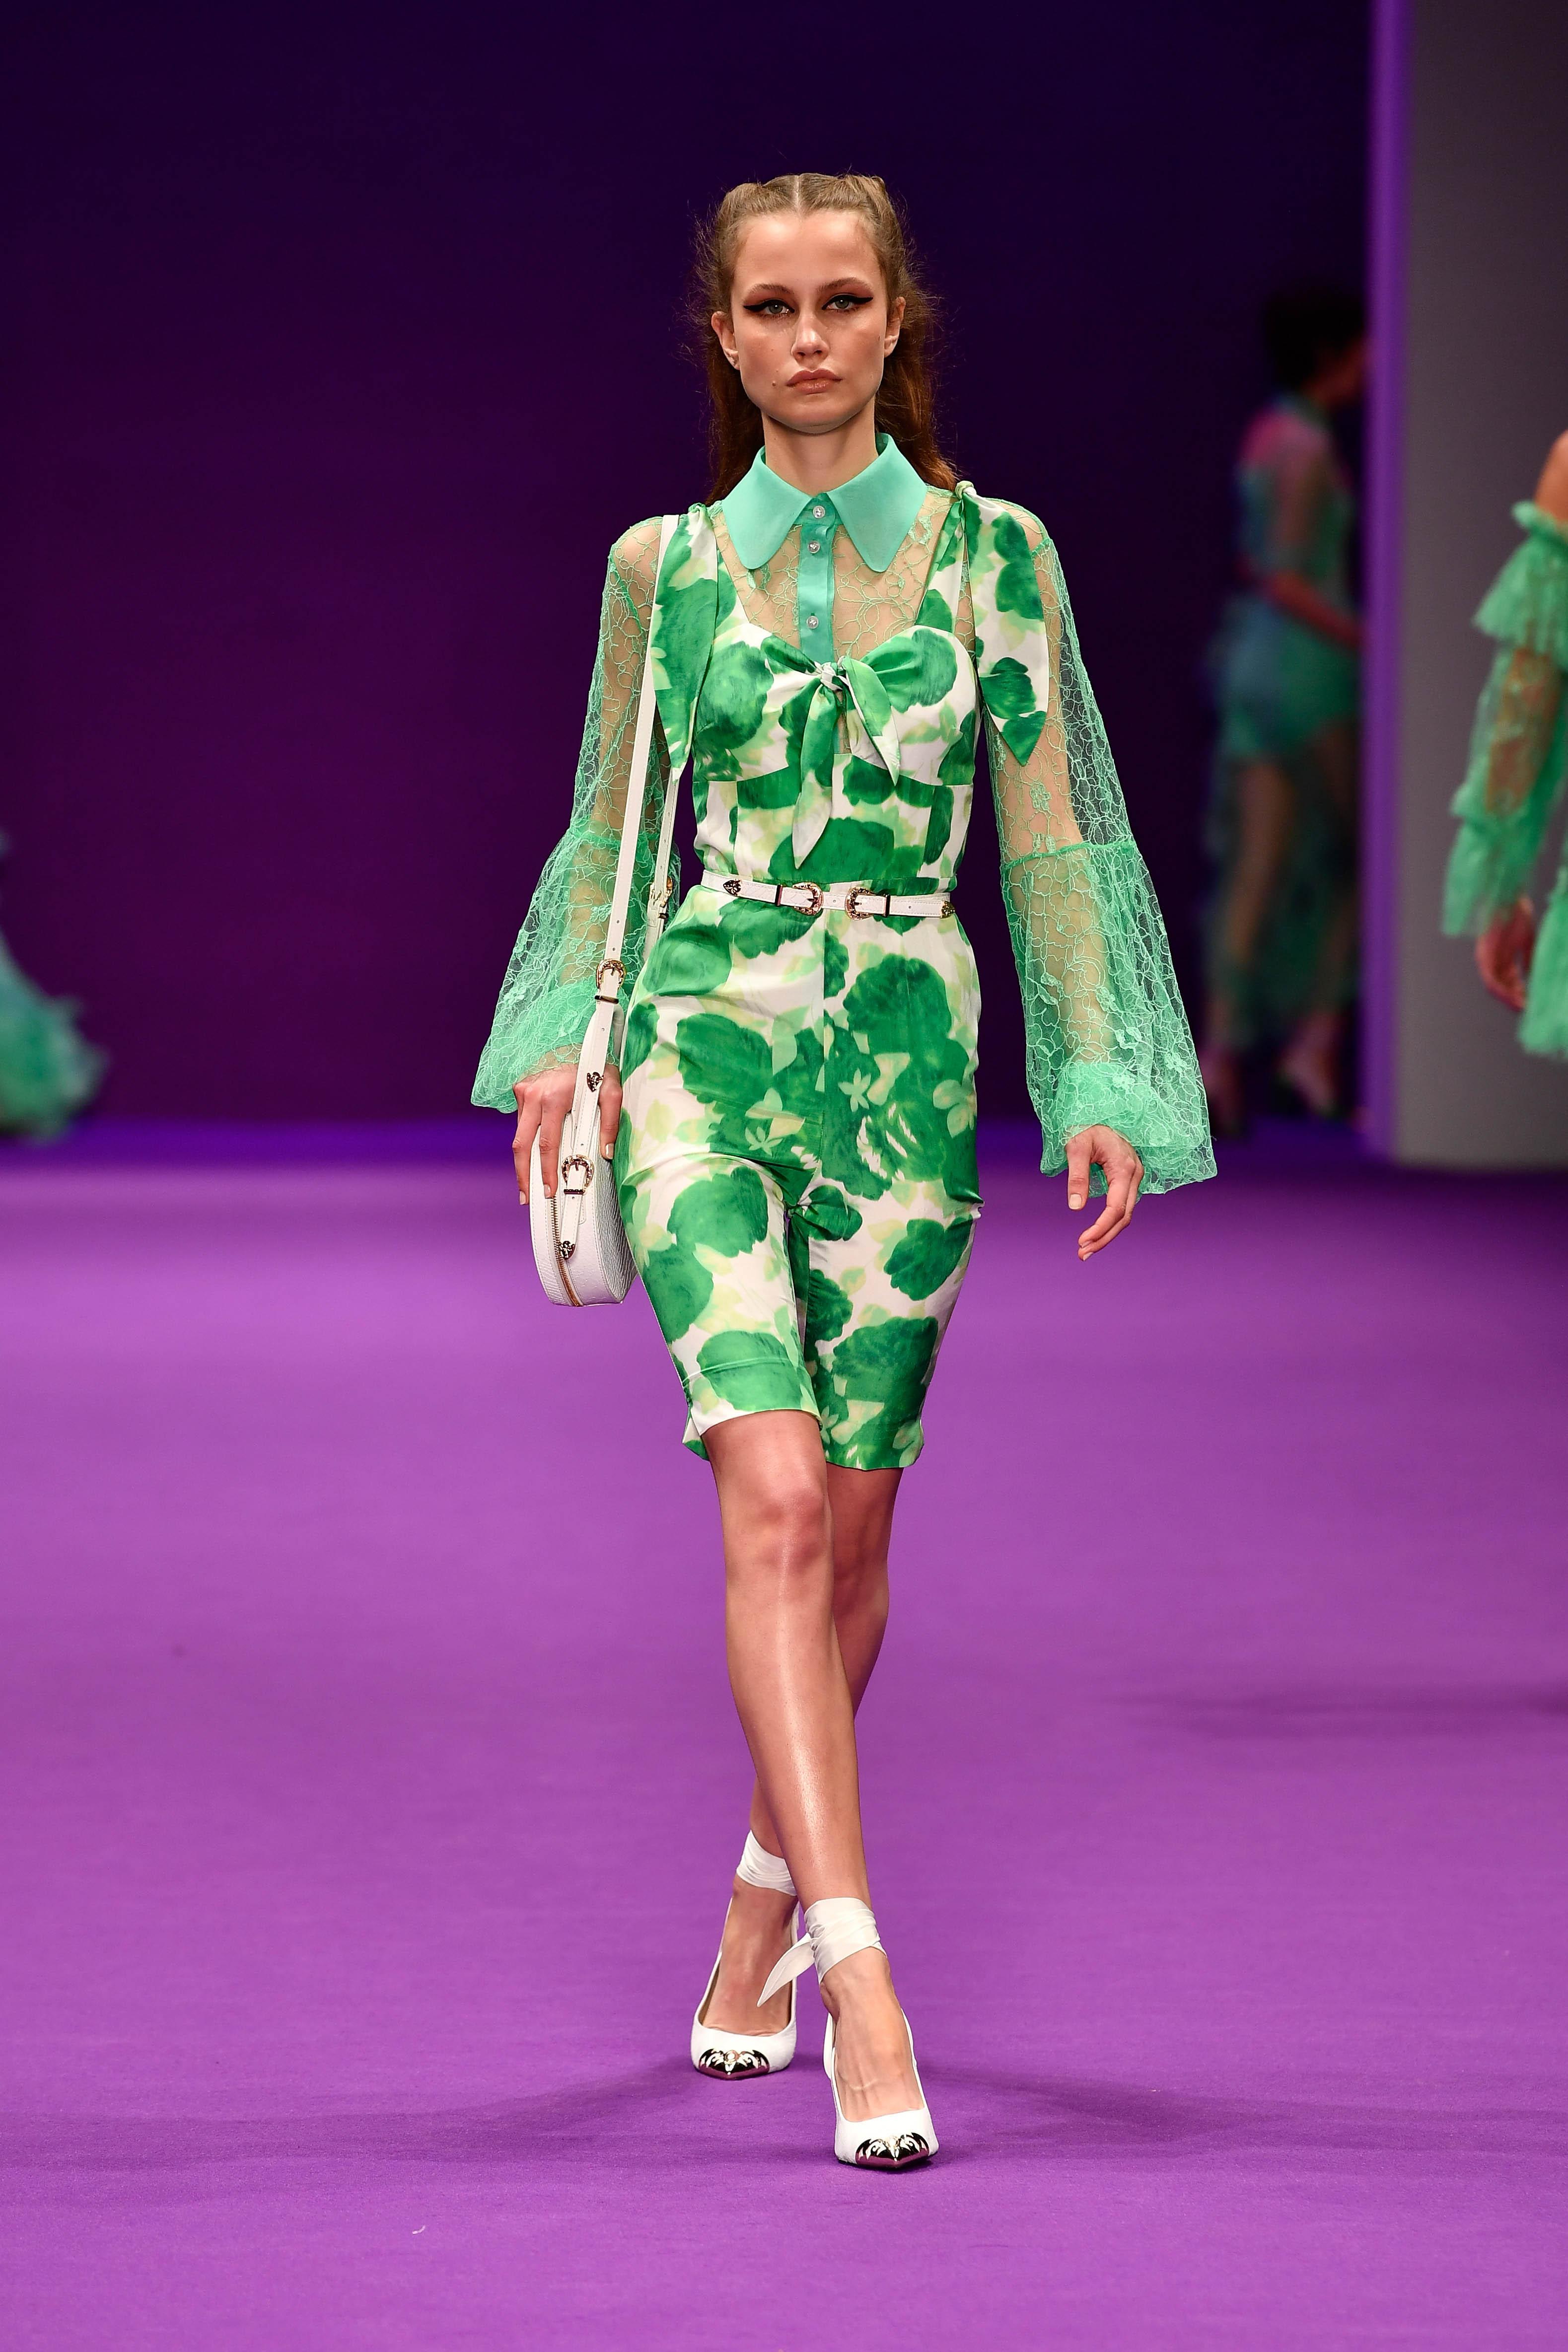 Nicholas Morley   Fashion, Fashion week, Runway fashion